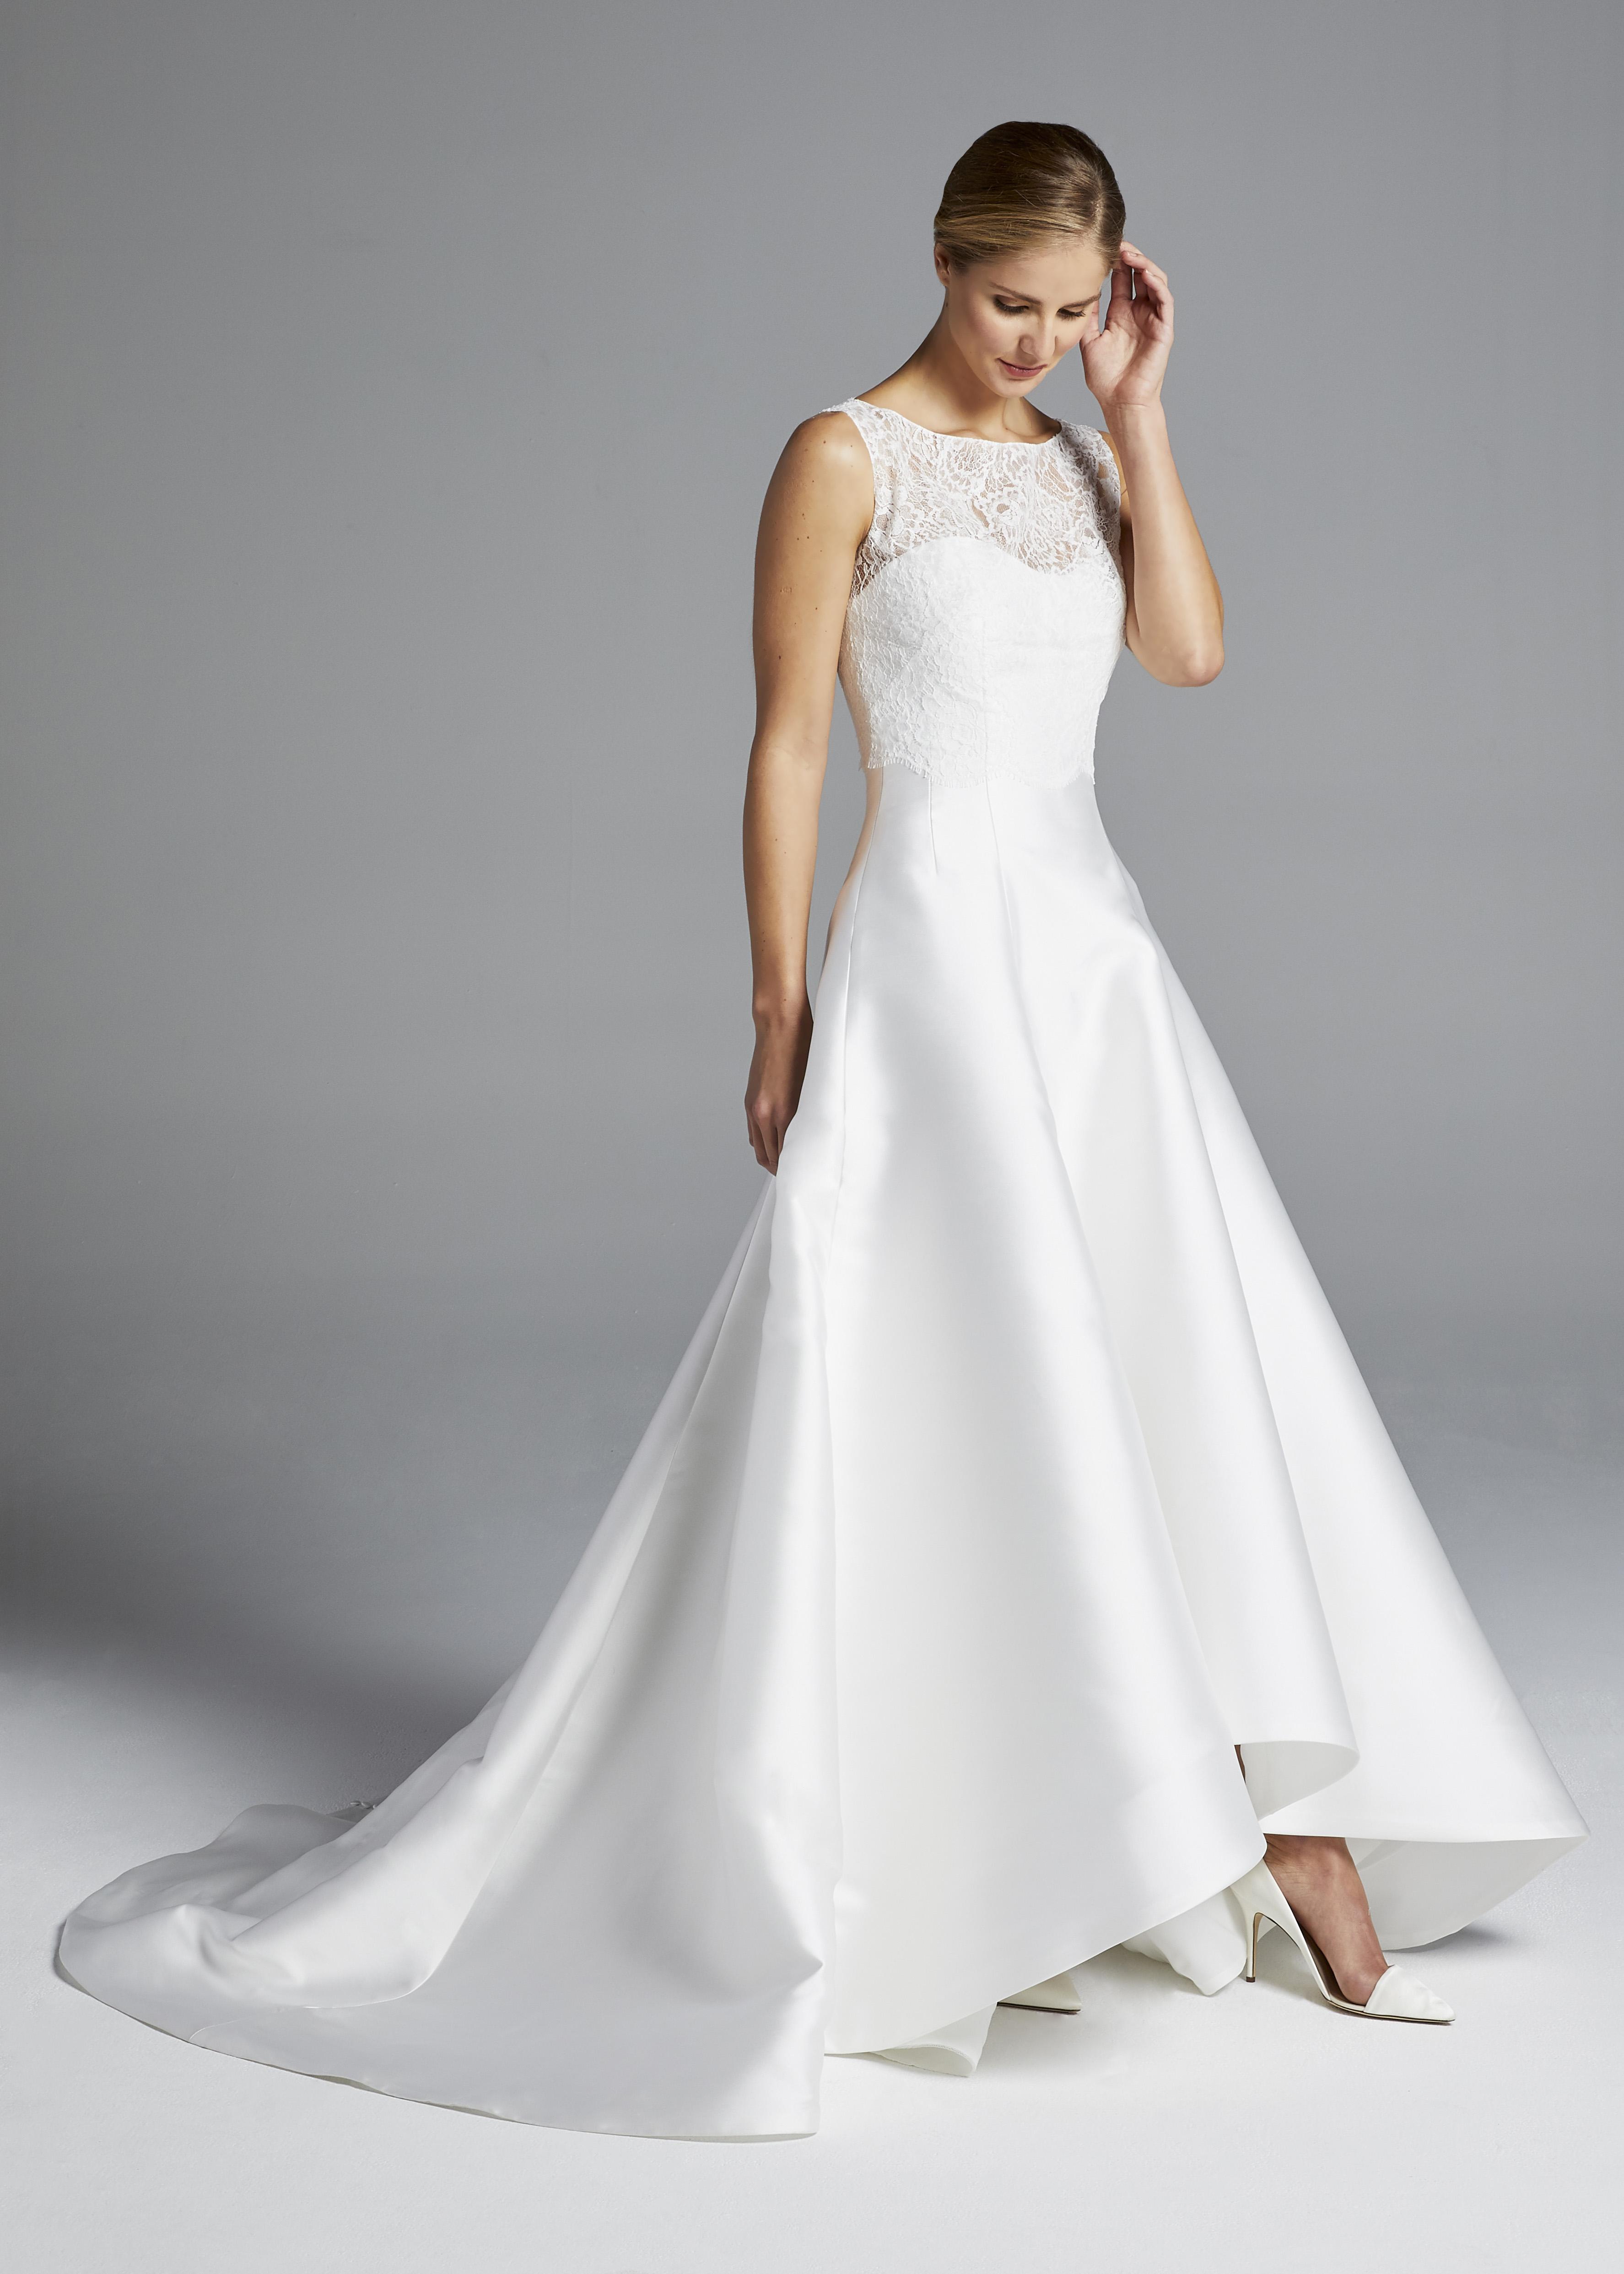 anne barge lace bateau wedding dress spring 2019